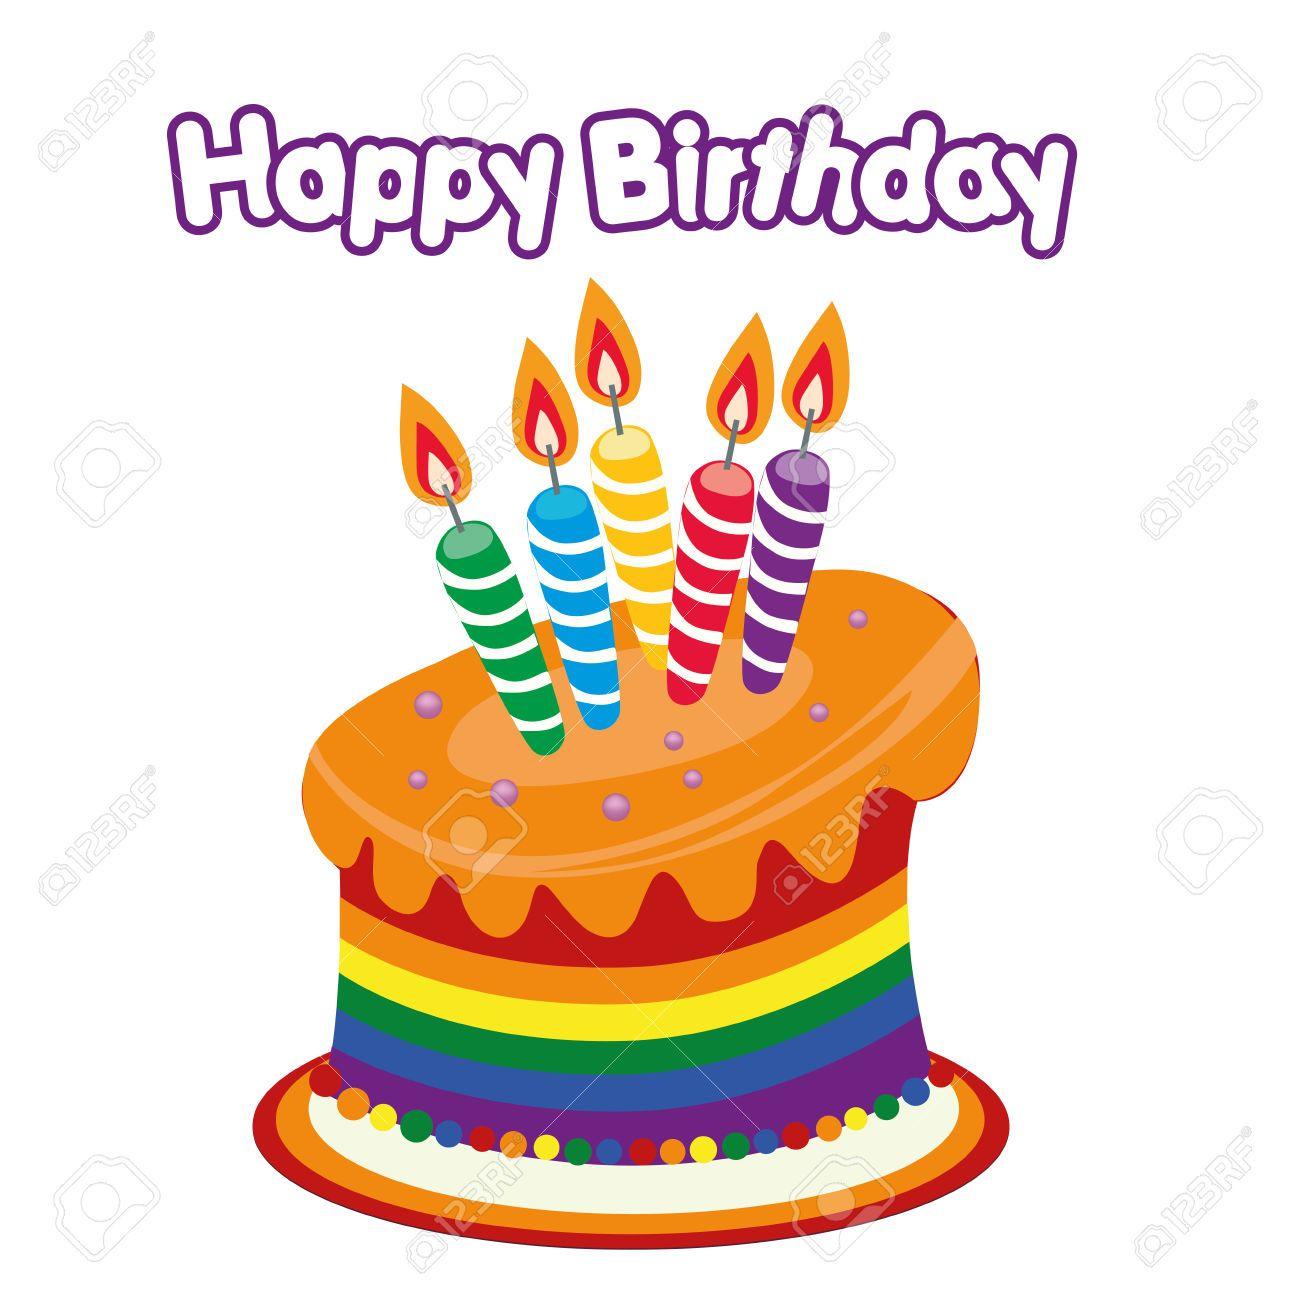 Birthday Cake Clip Art Vector : Happy Birthday Cake Clipart a Colored Happy Birthday Cake ...